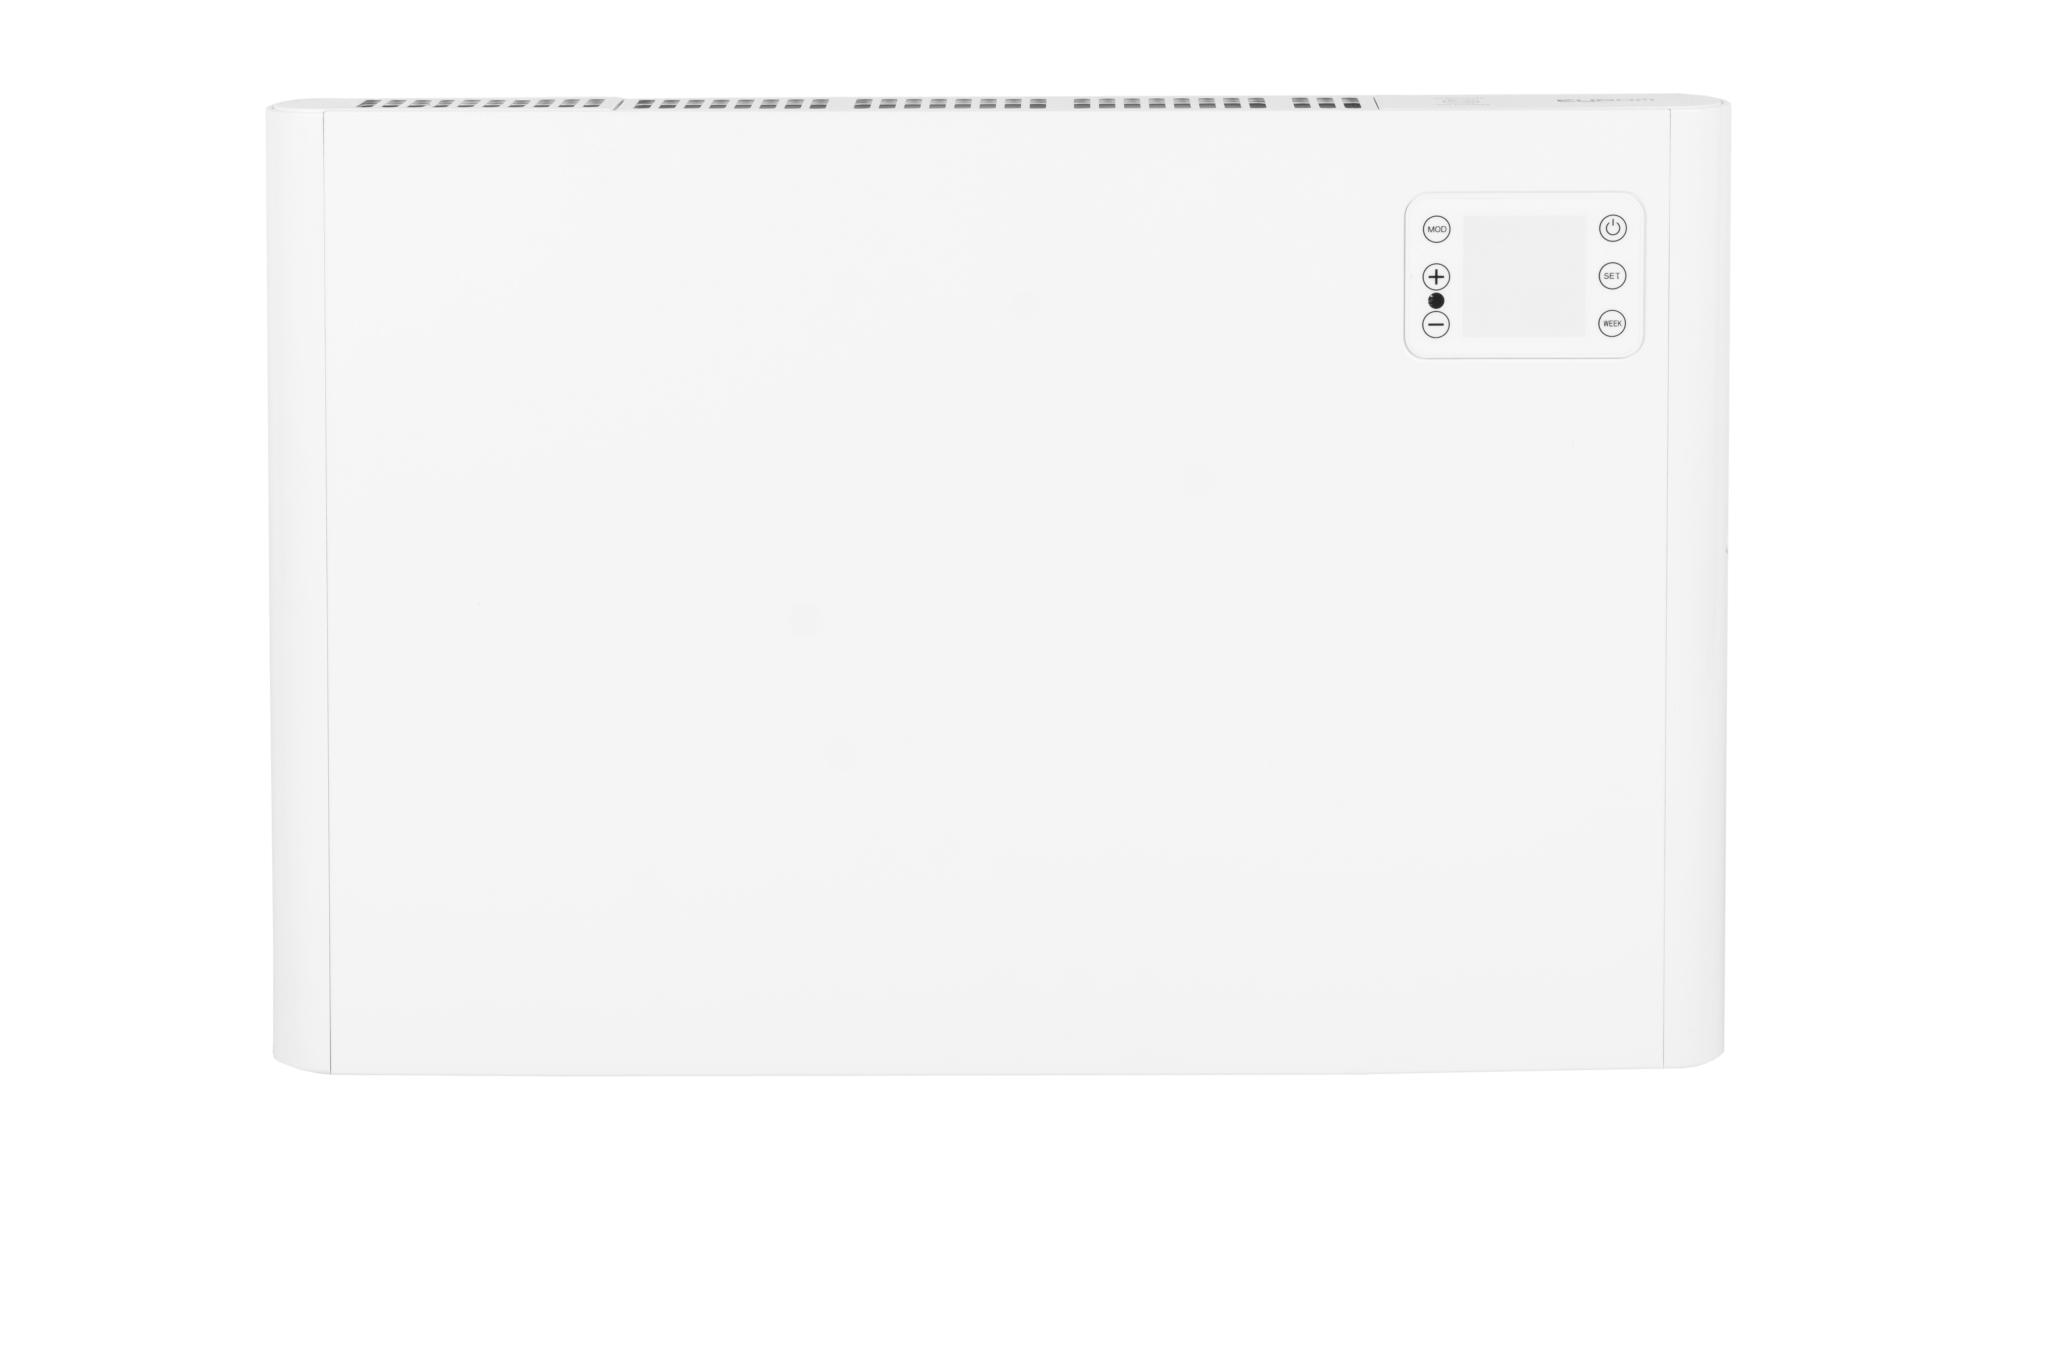 Eurom Alutherm 1000 WiFi Convectorkachel   Moderne Kachel met LED Display